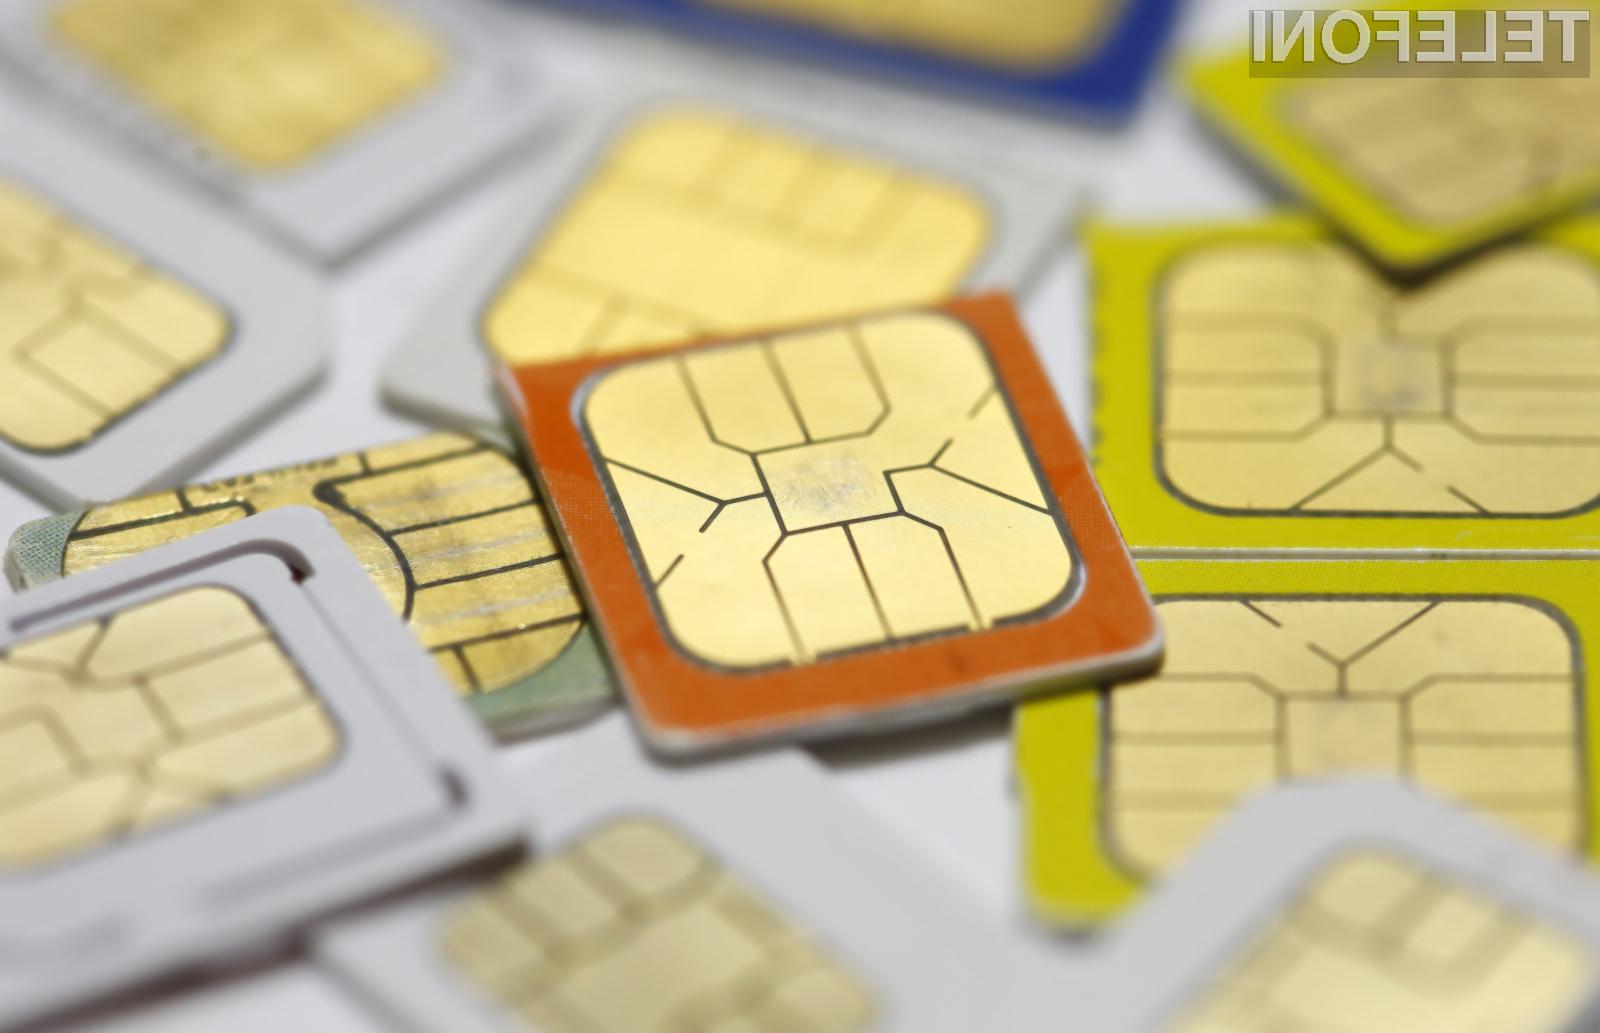 Američani zaustavili razvoj elektronske telefonske kartice!